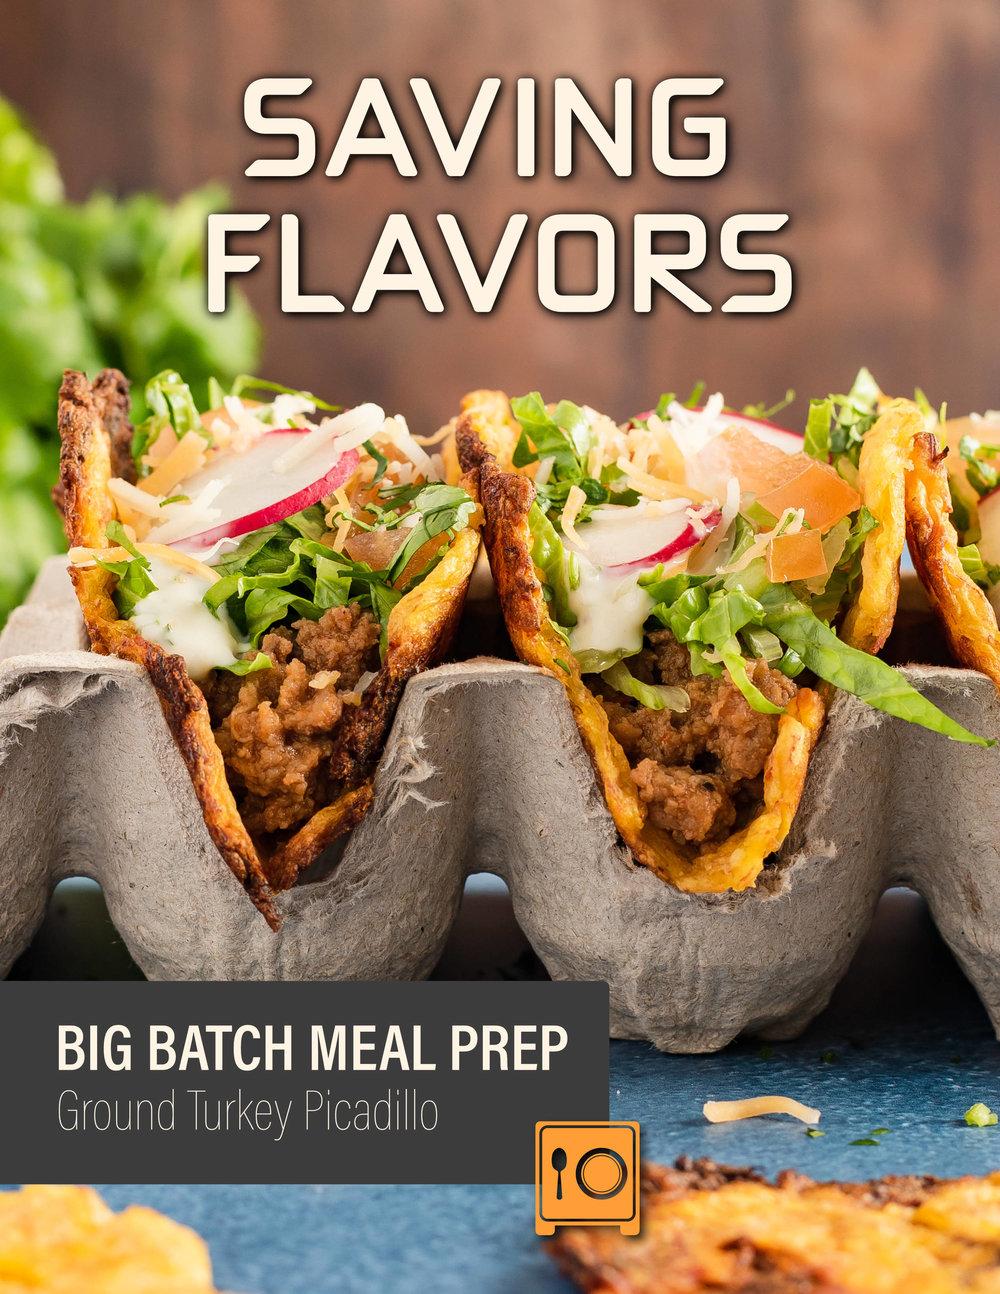 Ground Turkey Picadillo recipes e-book, big batch meal prep cookbook